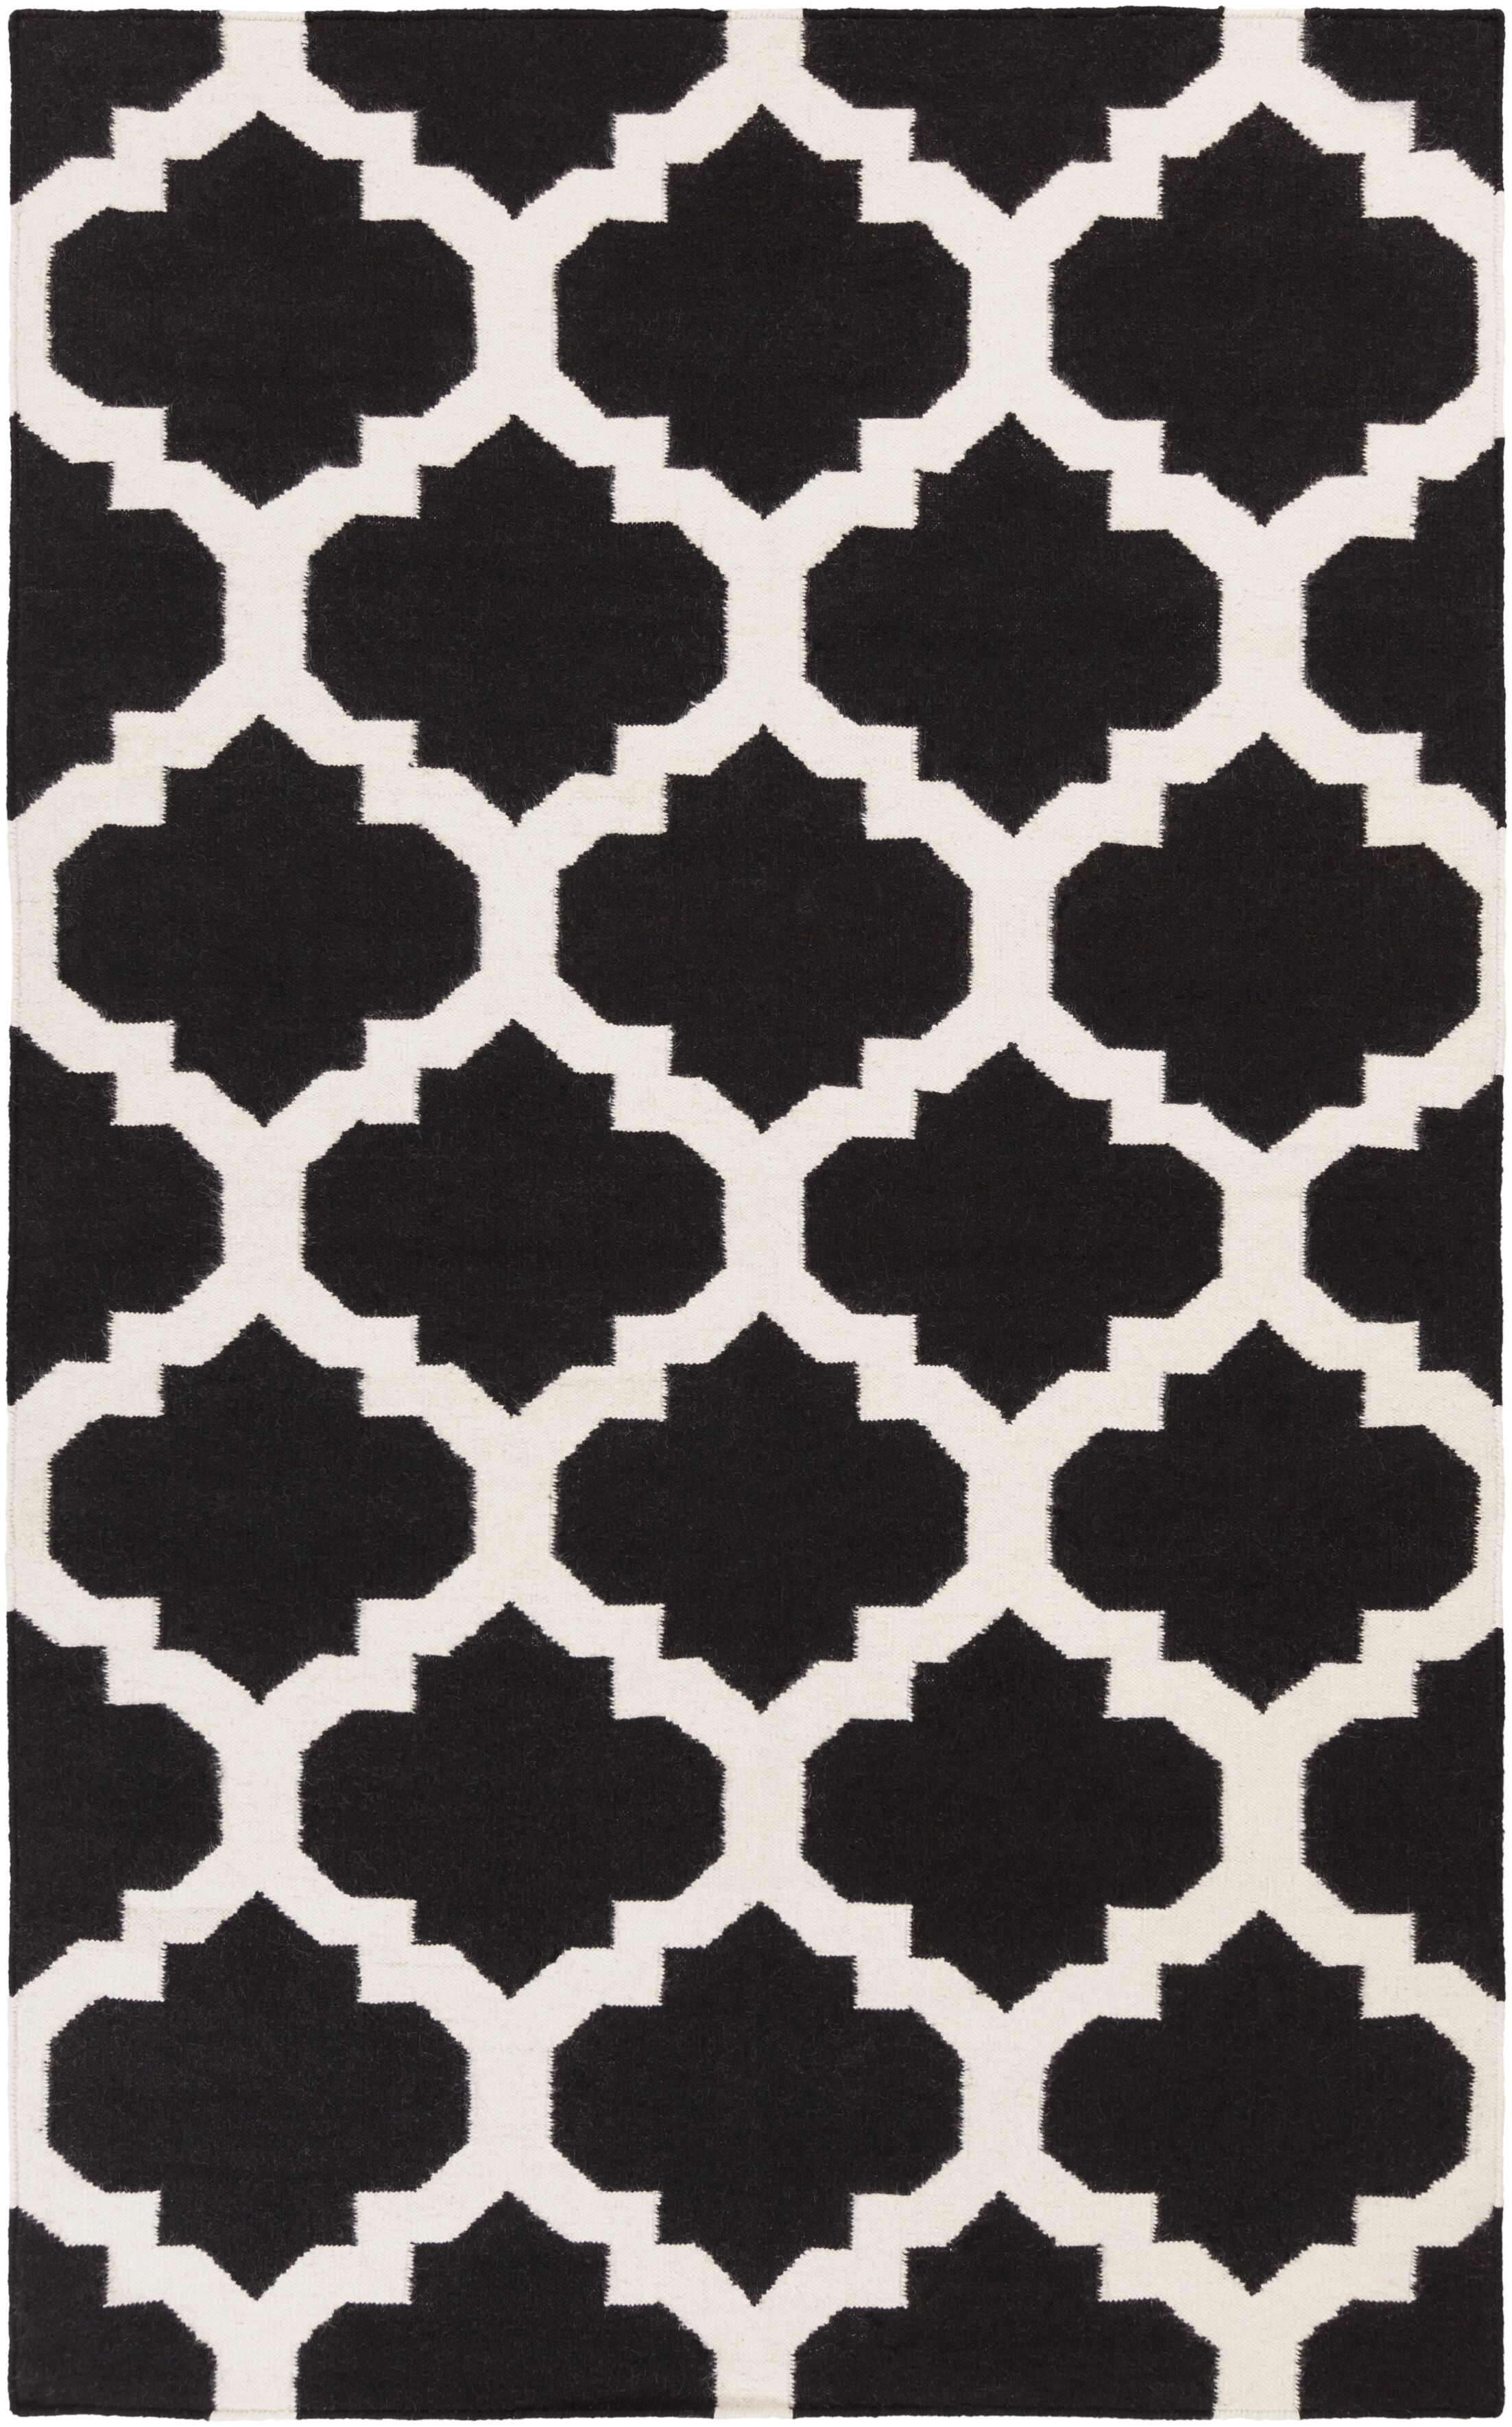 Bangor Black Geometric Area Rug Rug Size: Rectangle 9' x 12'